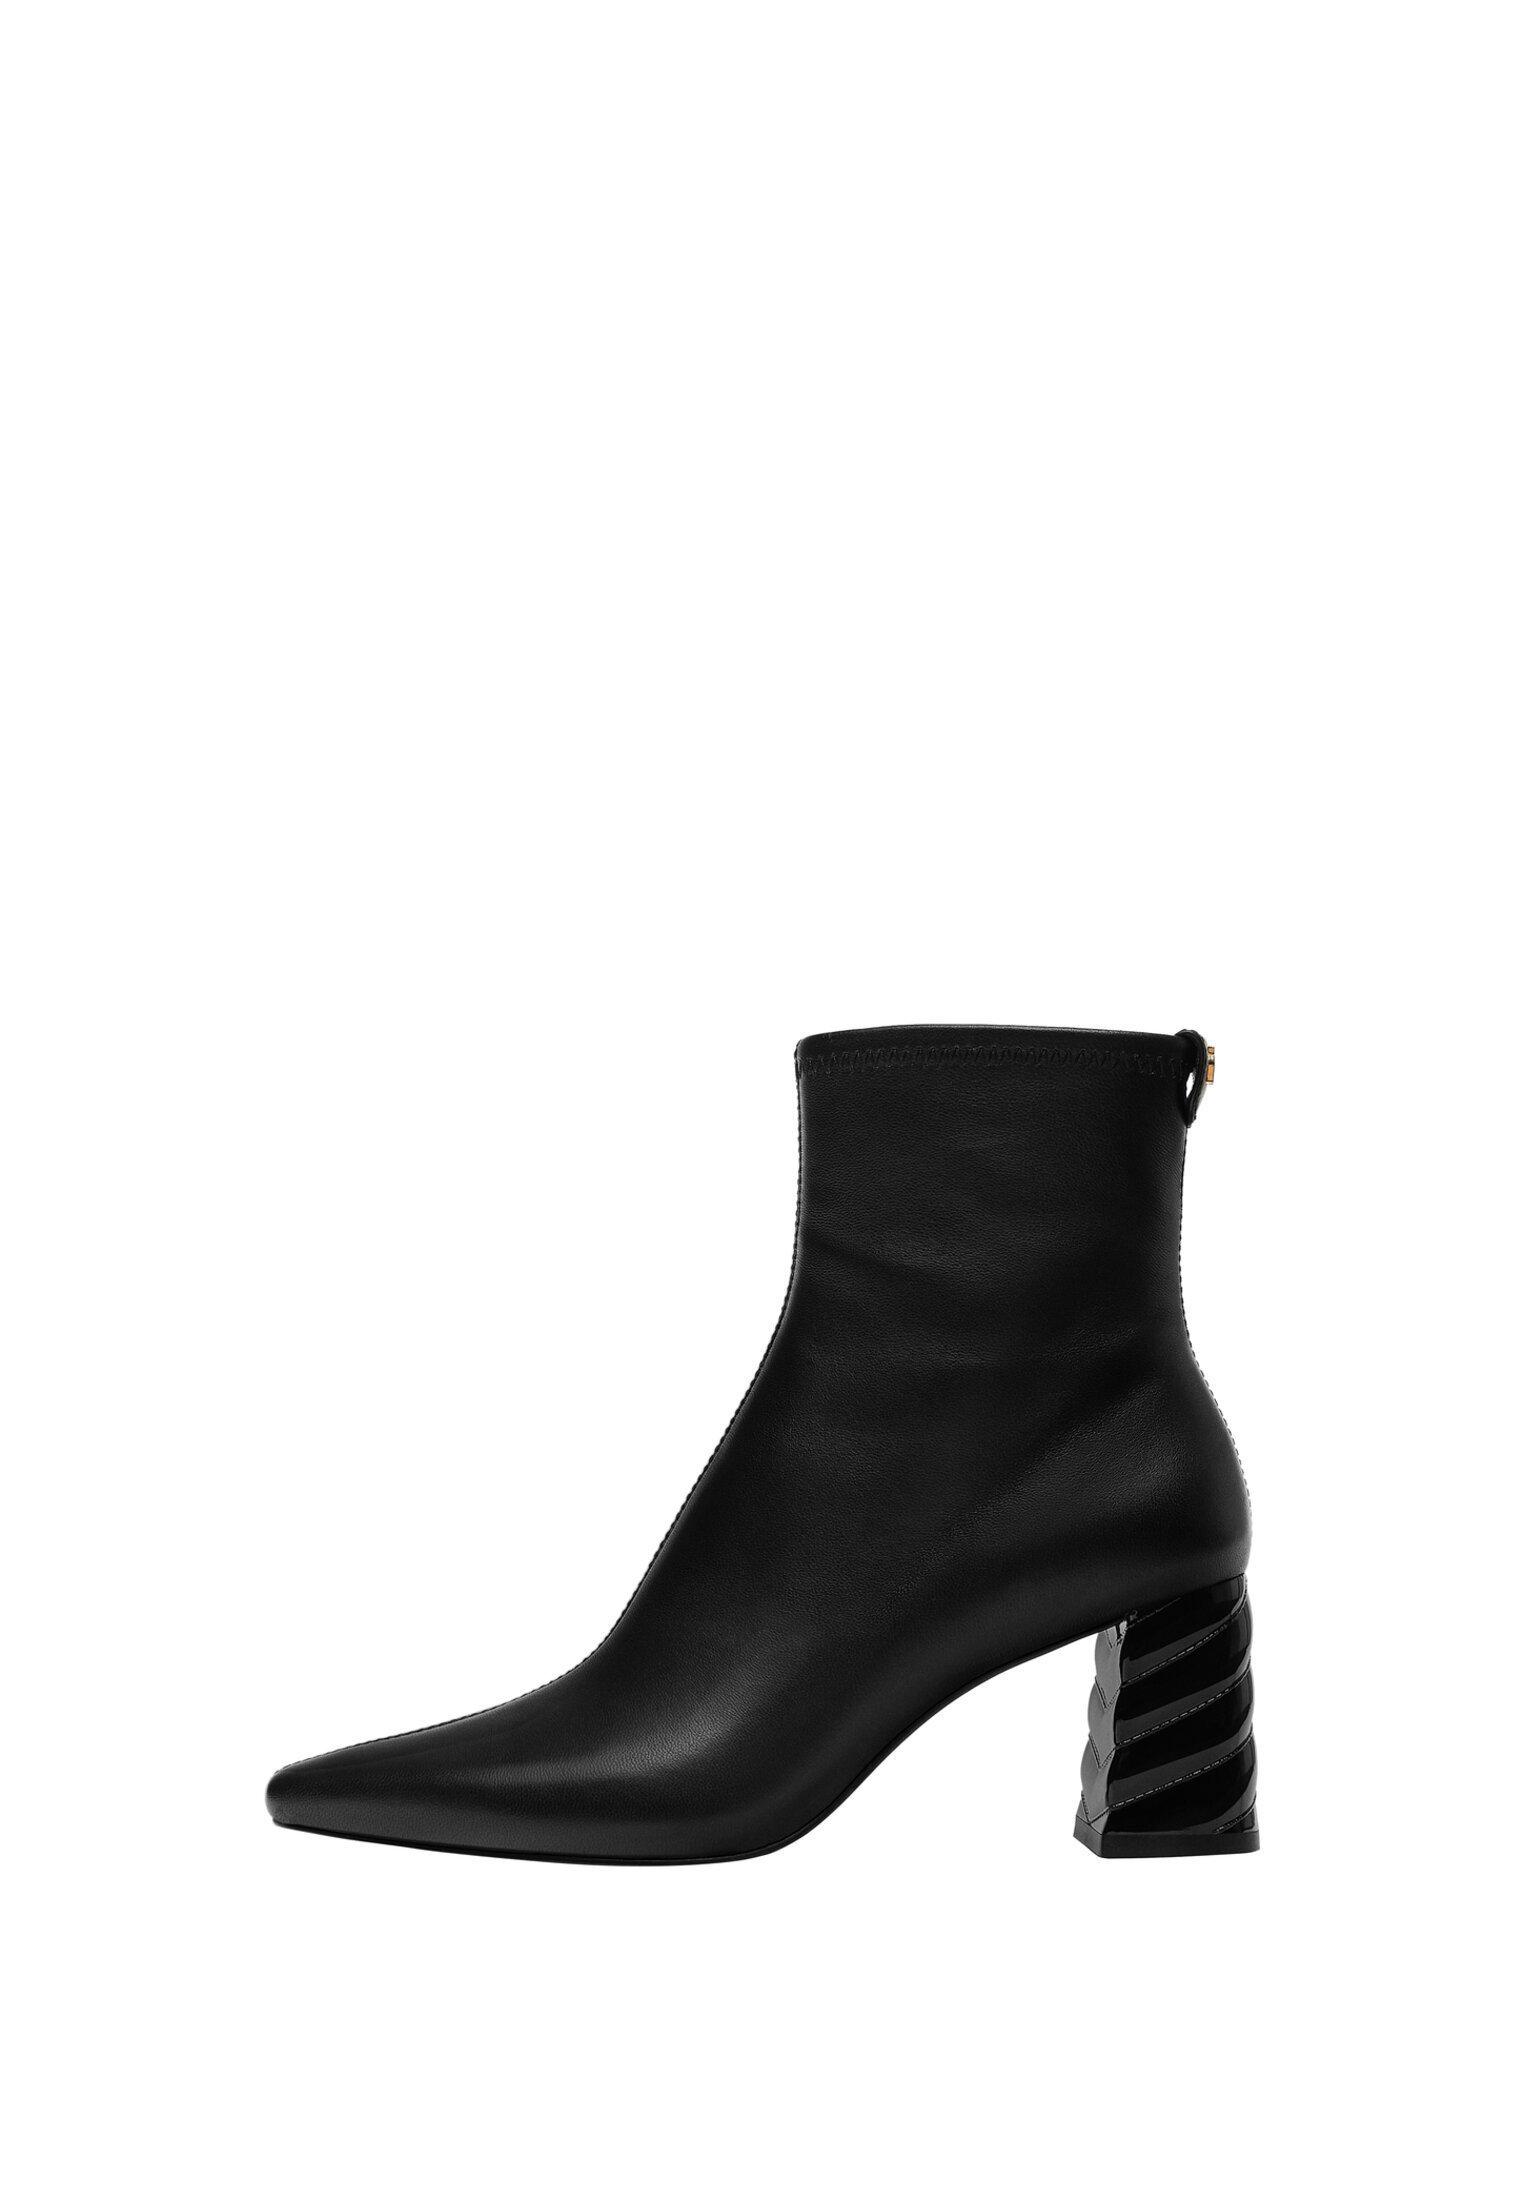 Uterqüe Ankle Boot - Black/schwarz